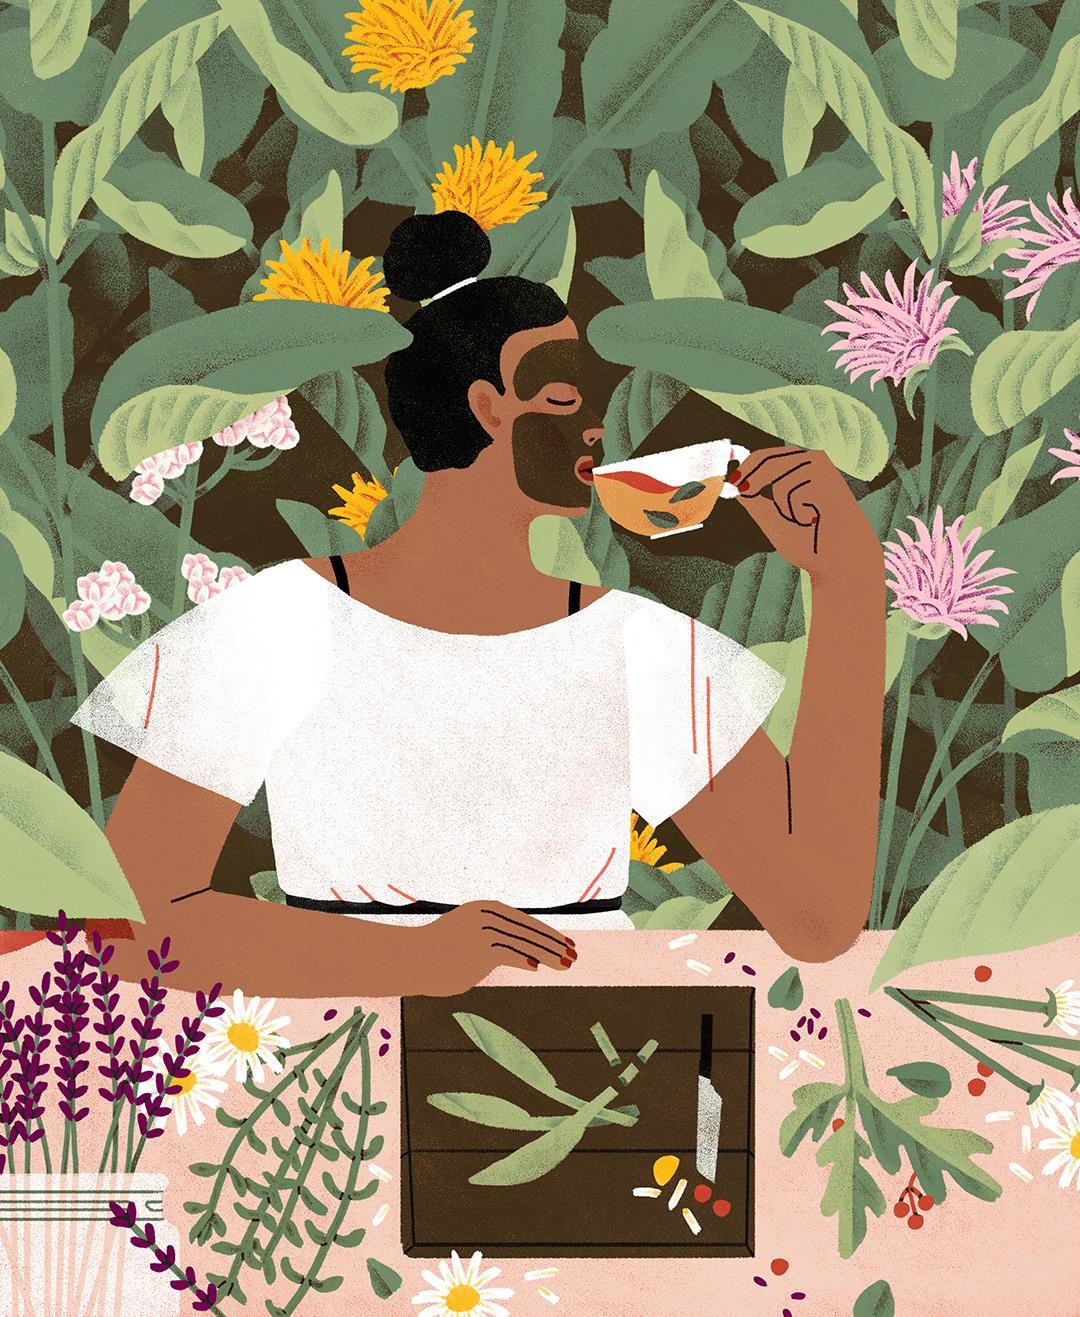 GirlsclubAsia-Illustrator-Jeannie Phan-BM-MAR18-Herbal-Healing-Final copy